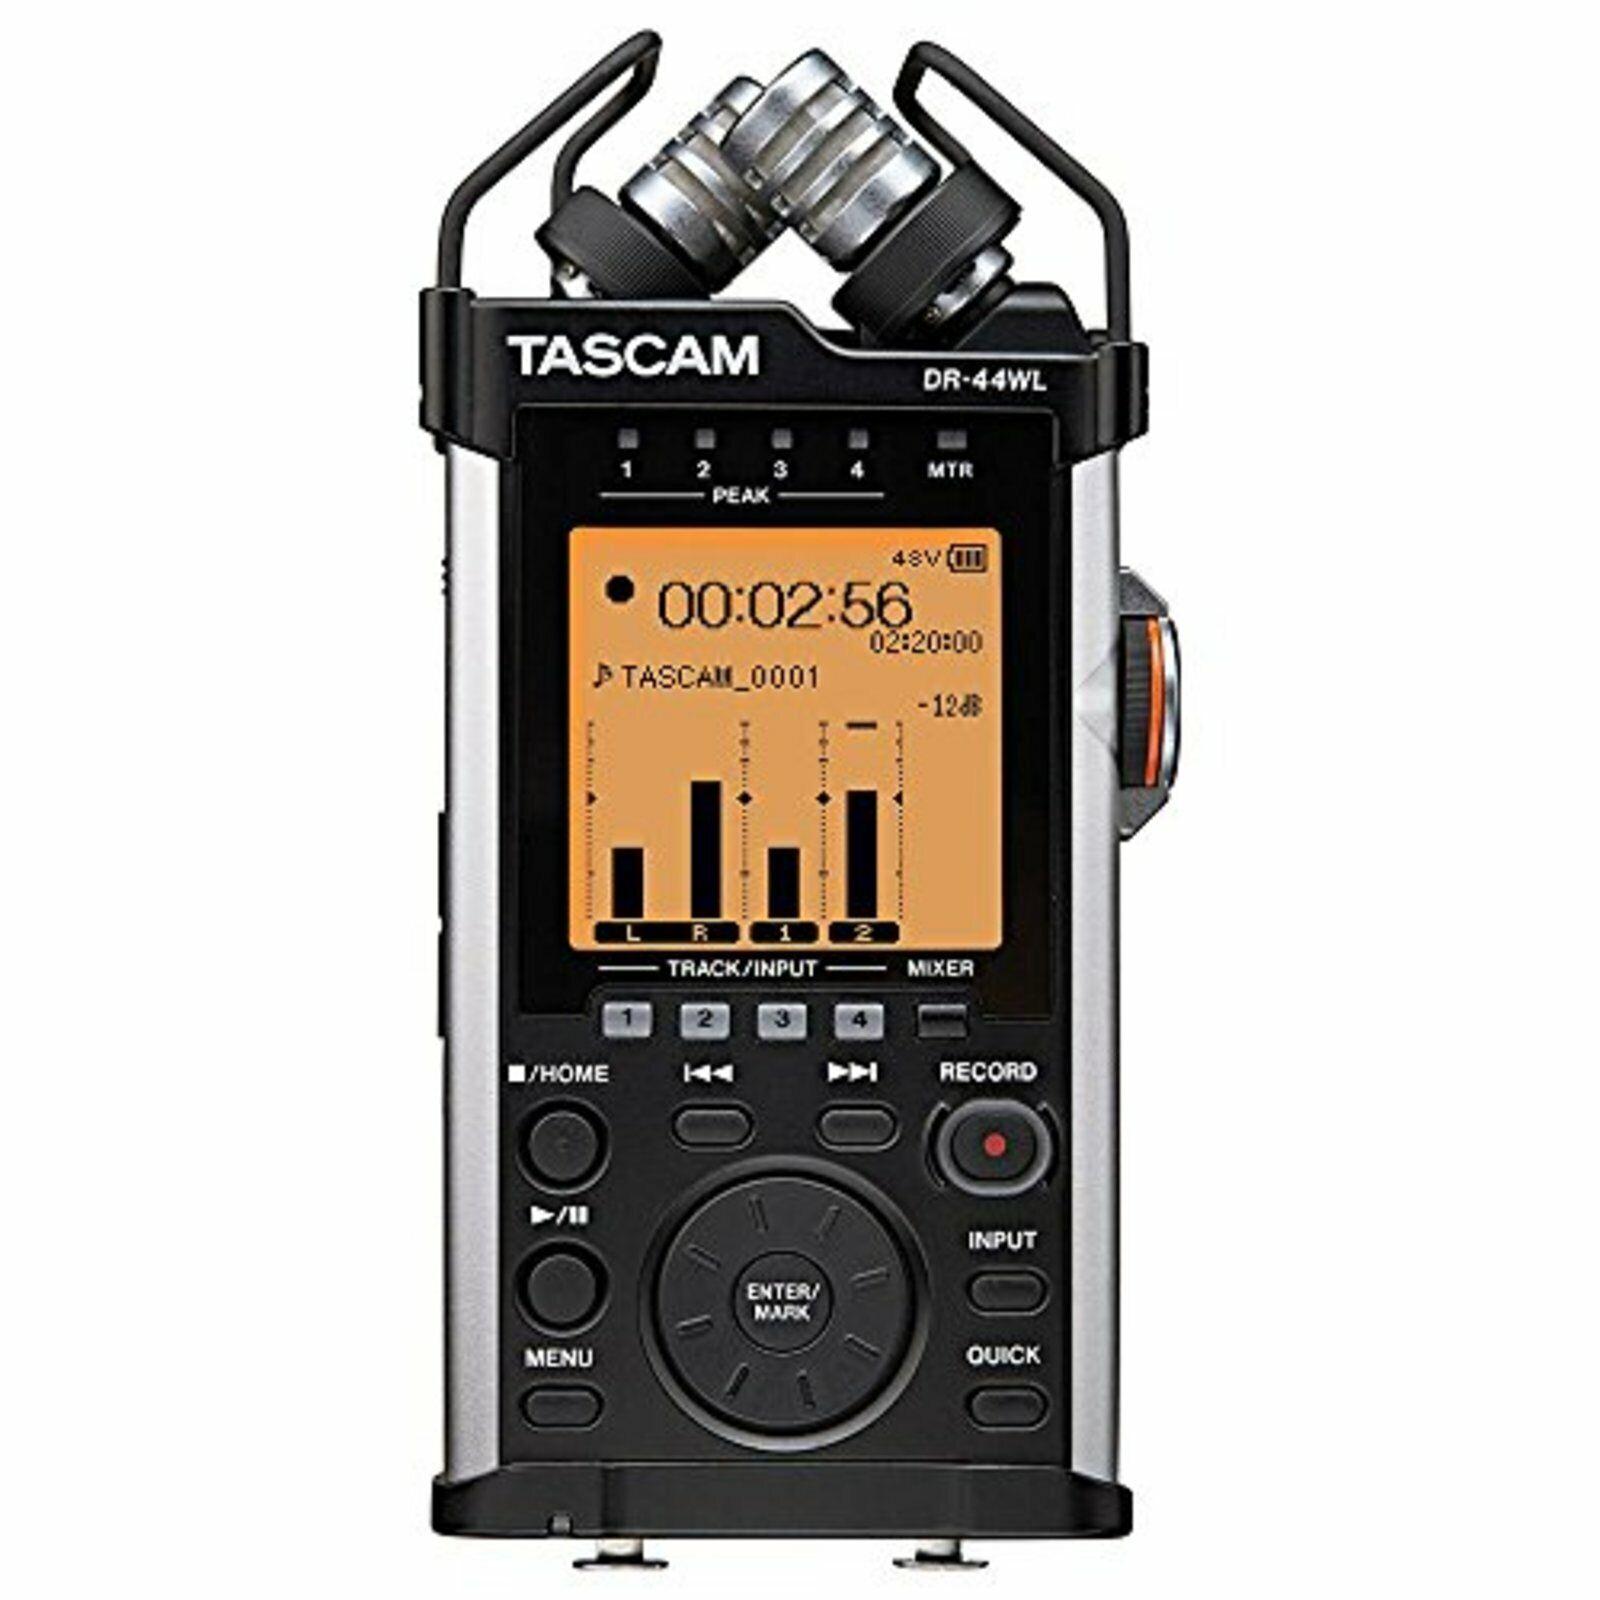 Tascam Linear Pcm Recorder Dr-44Wl Ver2-J Wi-Fi Fernbedienung Stoßdämpfer